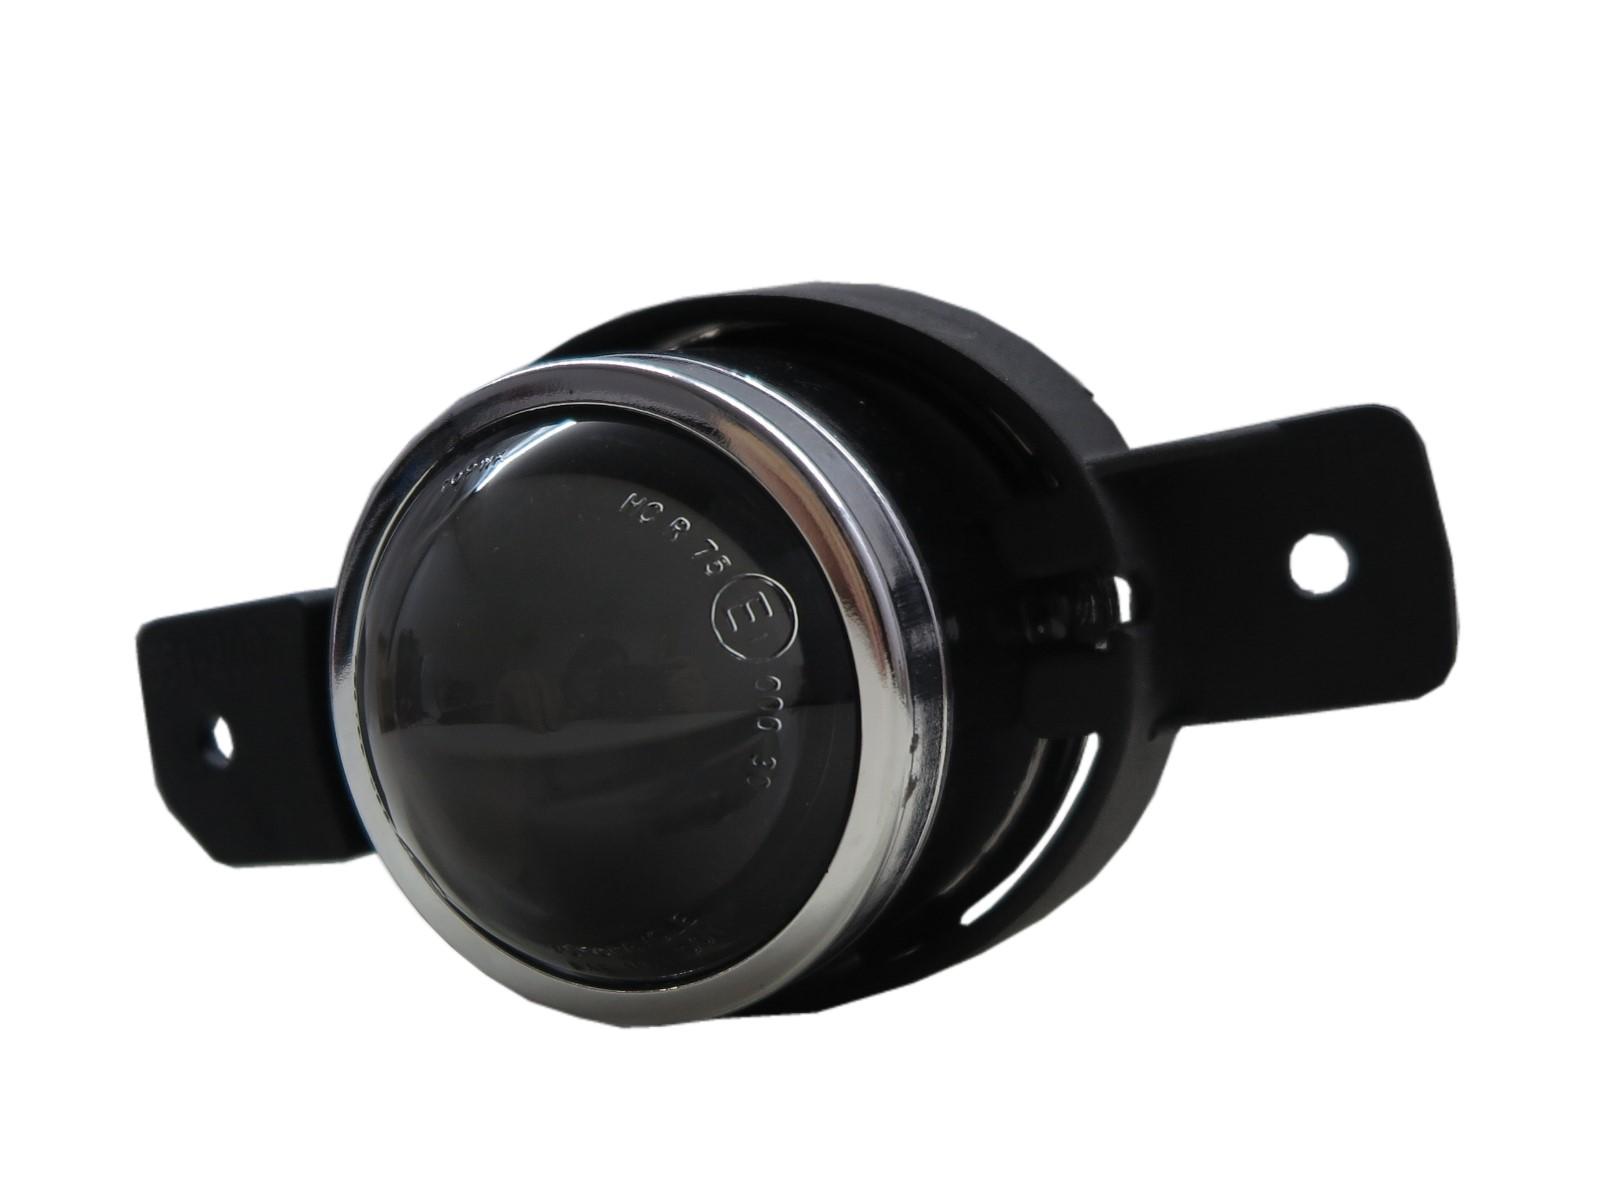 thumbnail 2 - Modus GRAND MODUS 2008-2012 MPV 5D Projector Fog Light Black for RENAULT